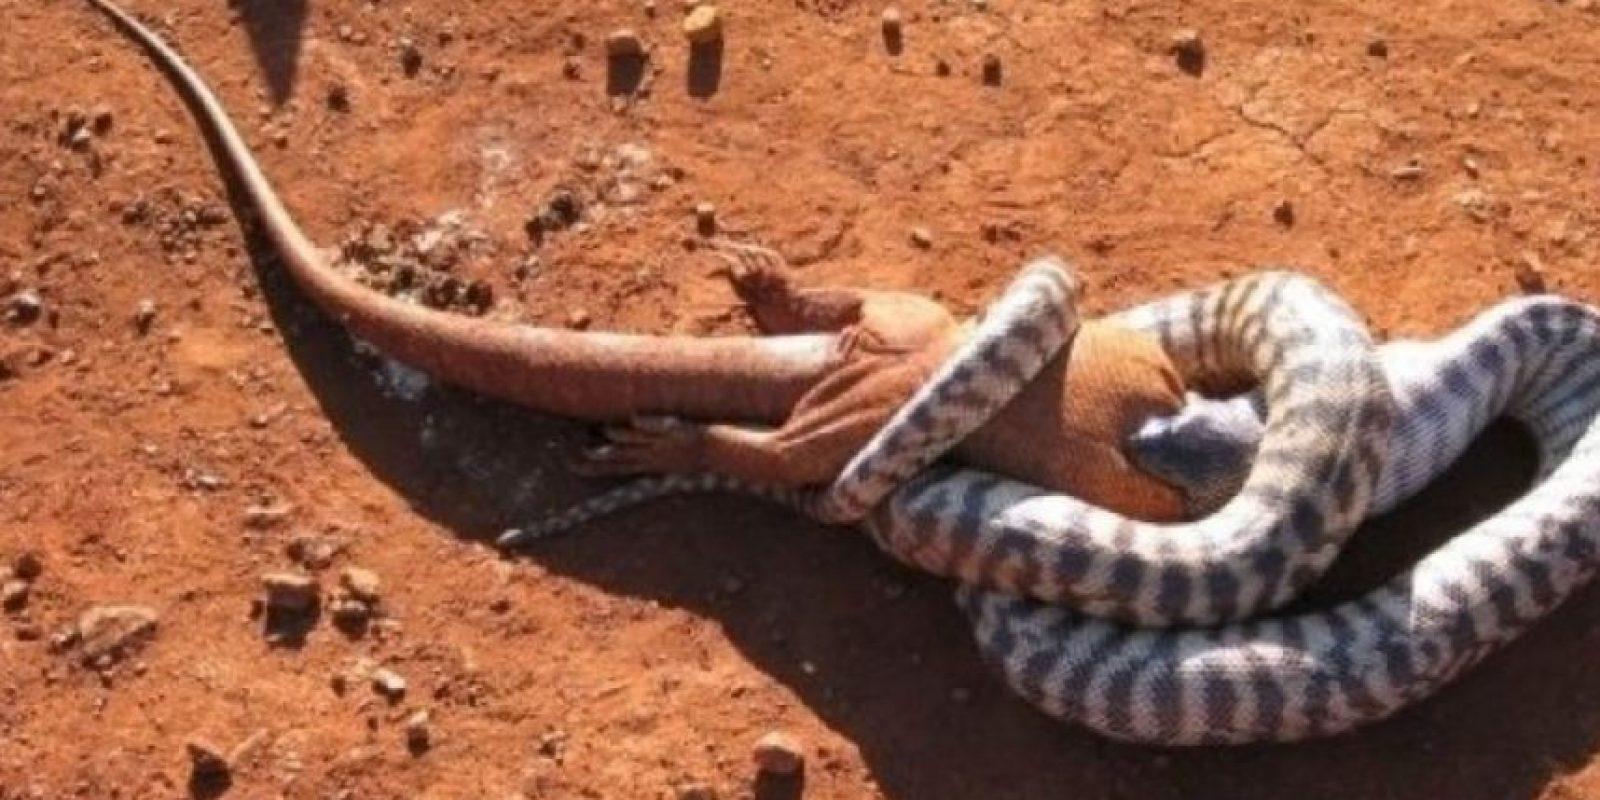 Serpientes alimentándose. Foto:Reddit